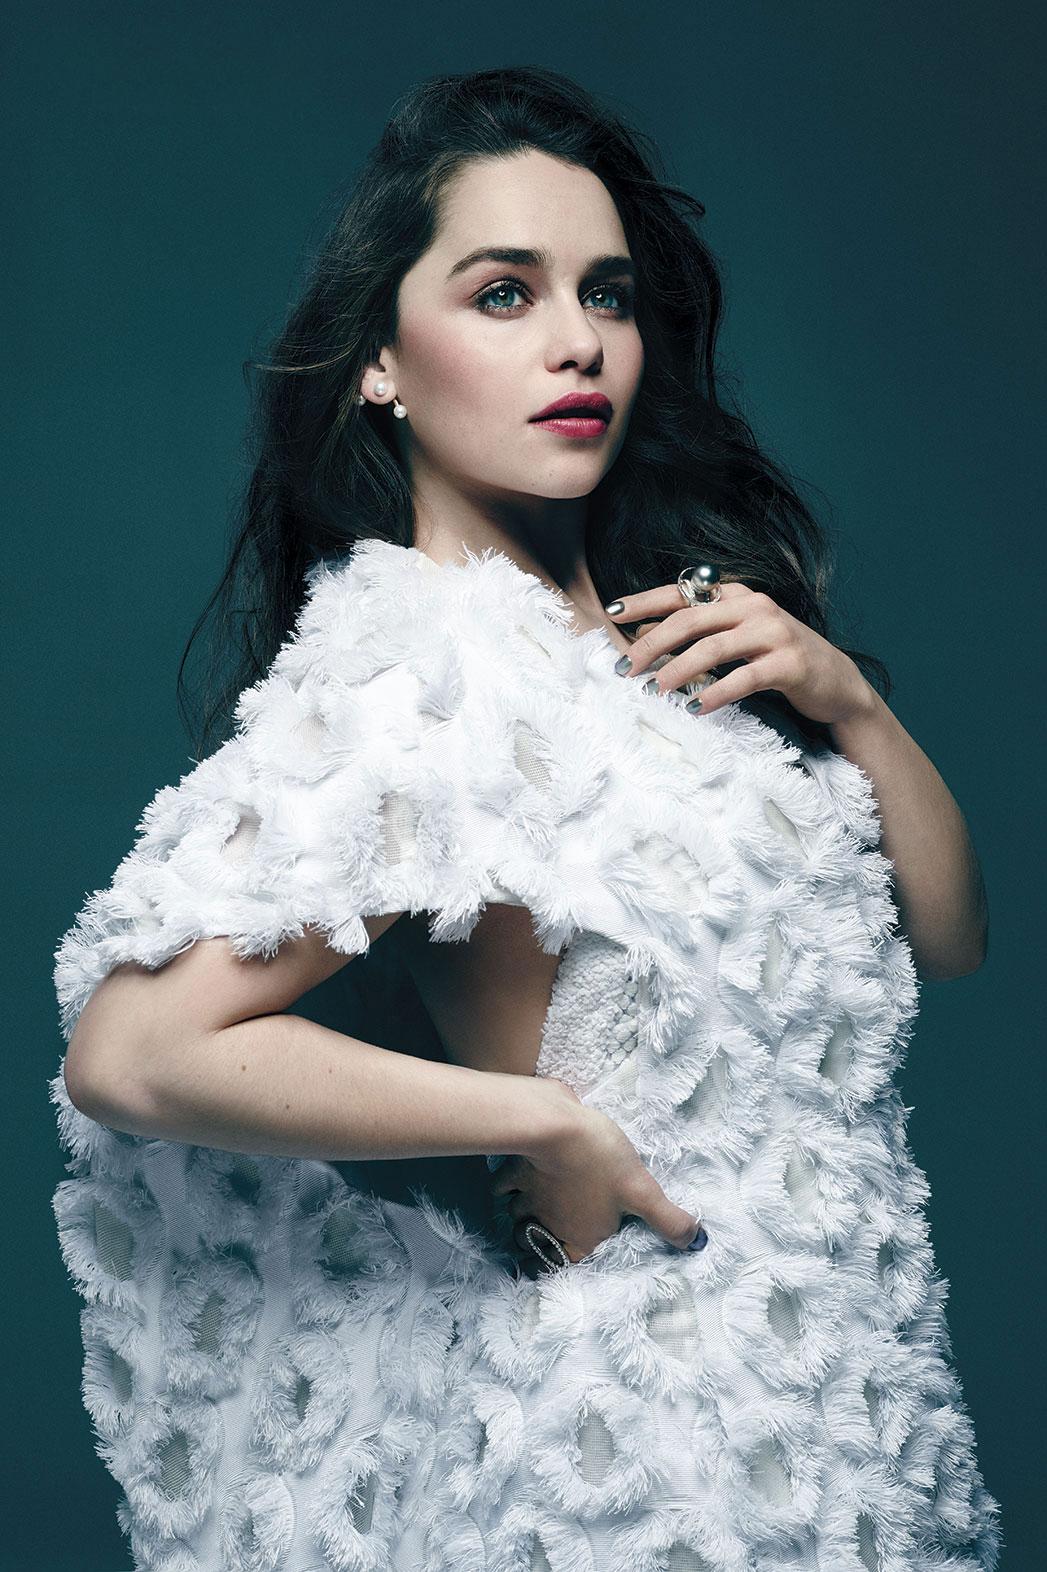 Emilia Clarke - The Hollywood Reporter (April 2015)